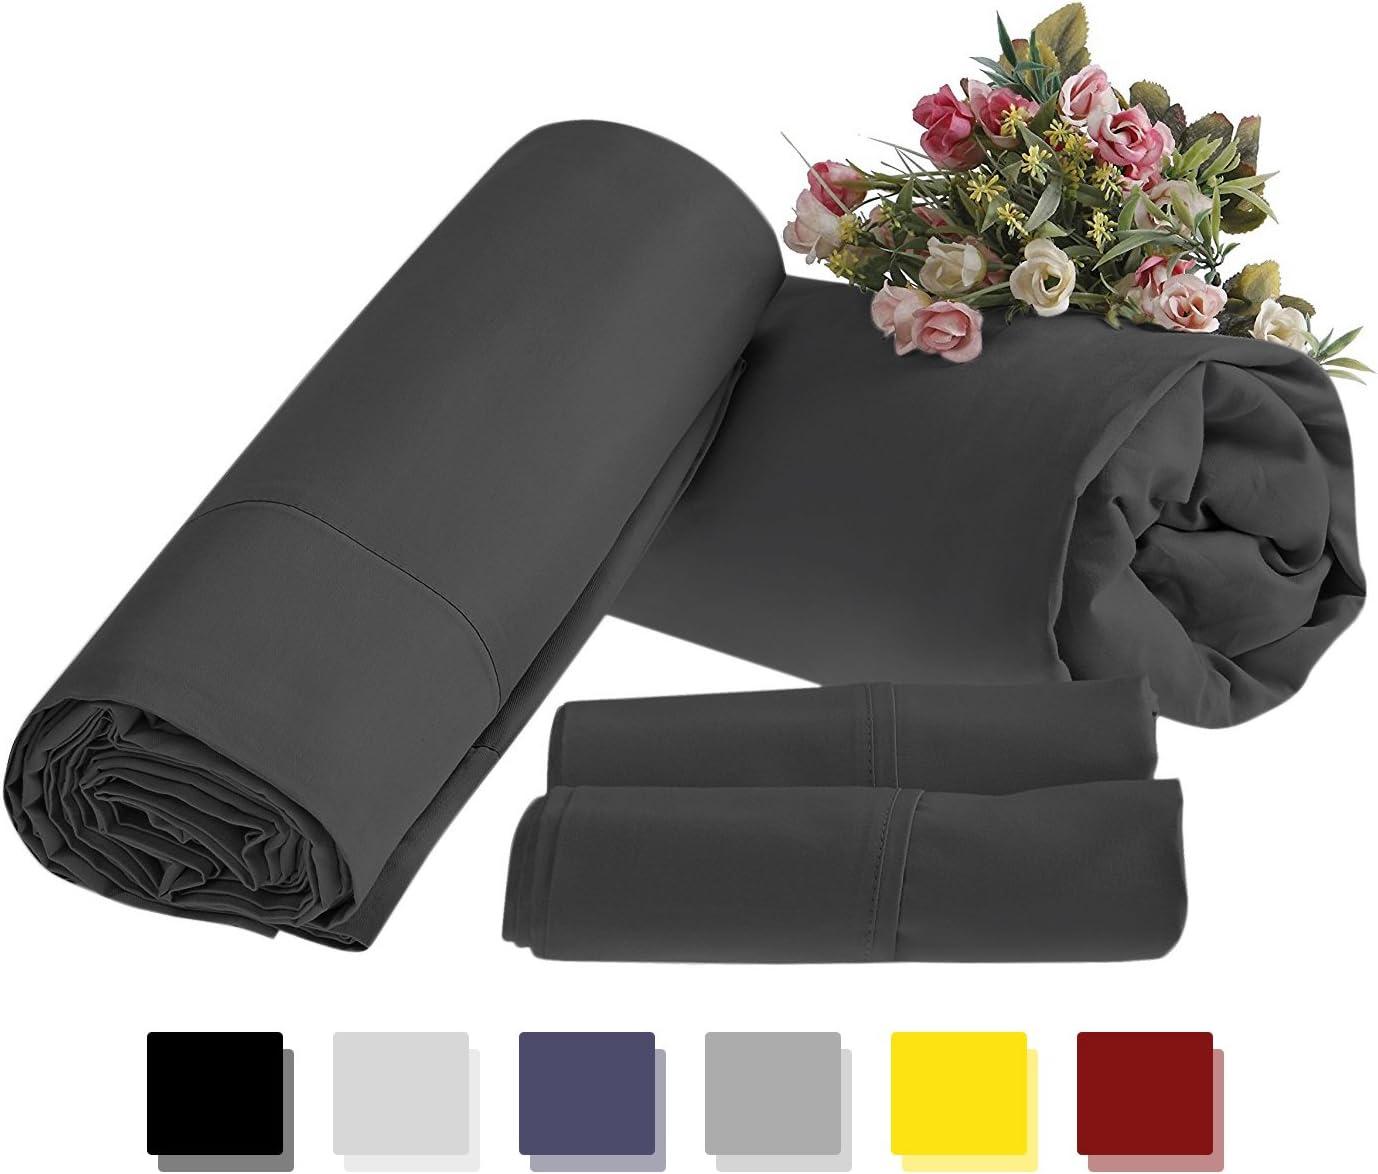 Mayfair Linen Bed Sheet Set 1800 Supreme Collection Bedspread 100% Brushed Micro Fiber Deep Pocket Premium Quality Bedding Set Dark Grey Twin XL